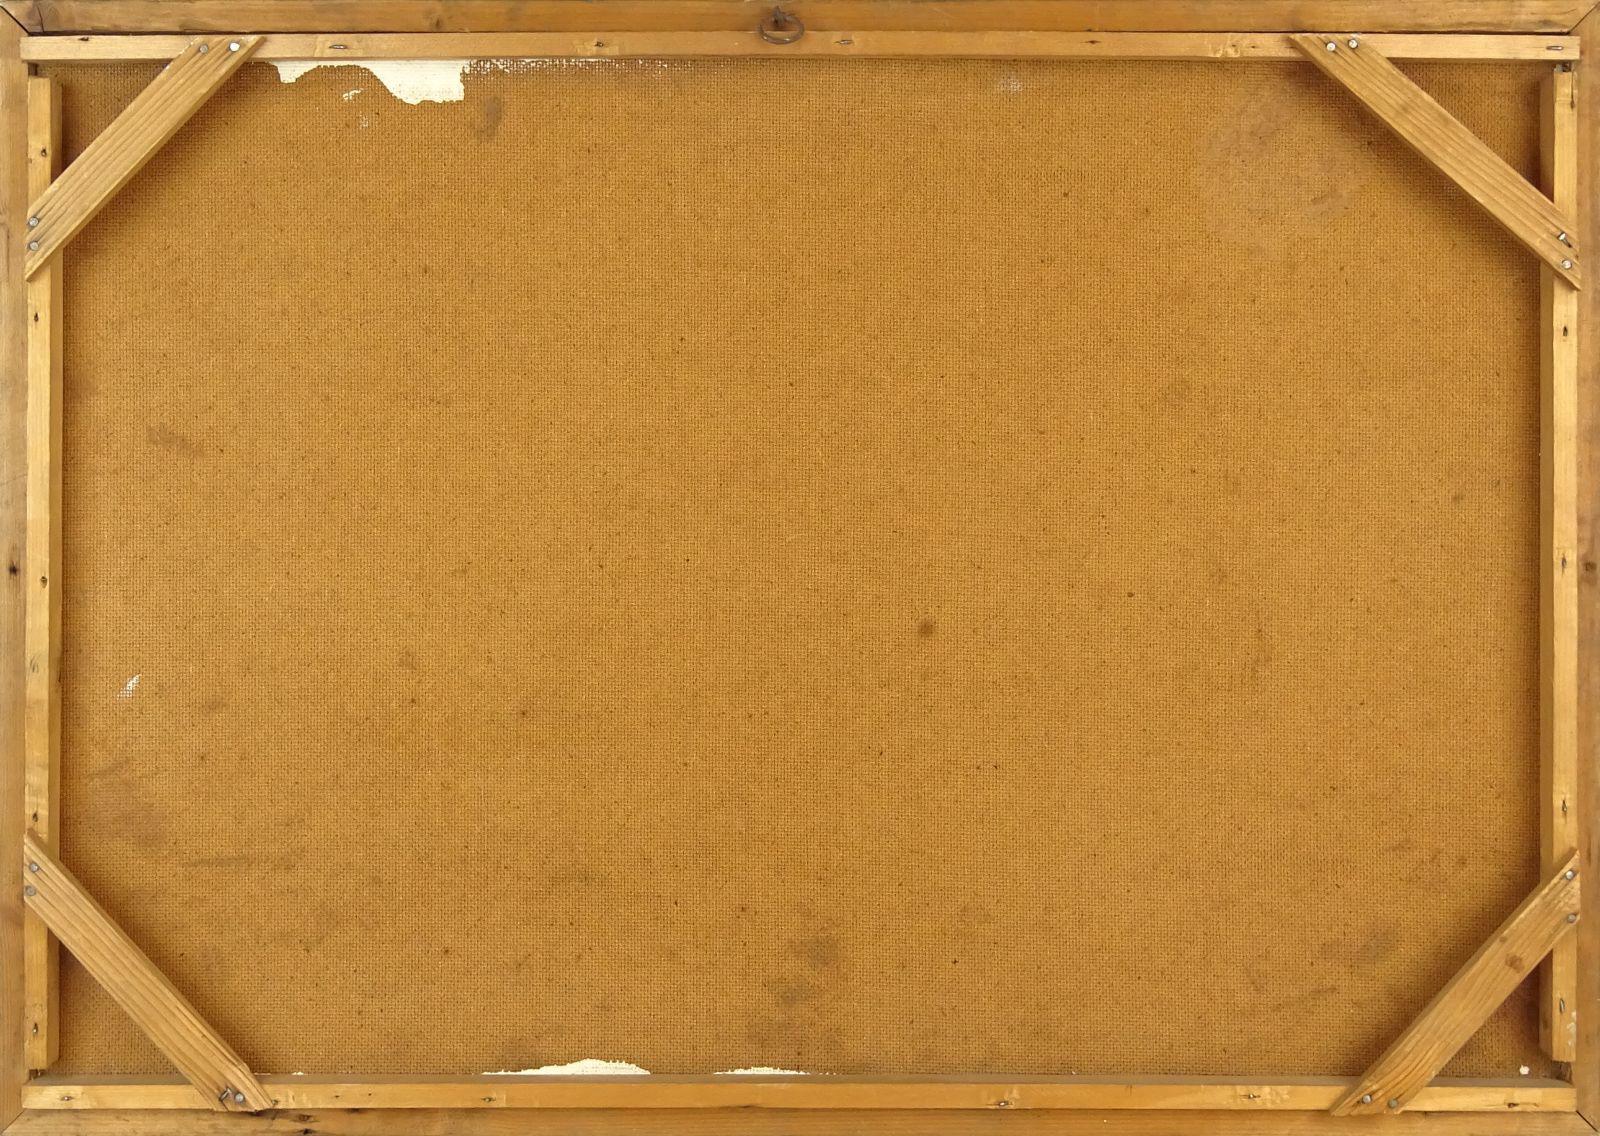 DSC01671.JPG (1600×1136)